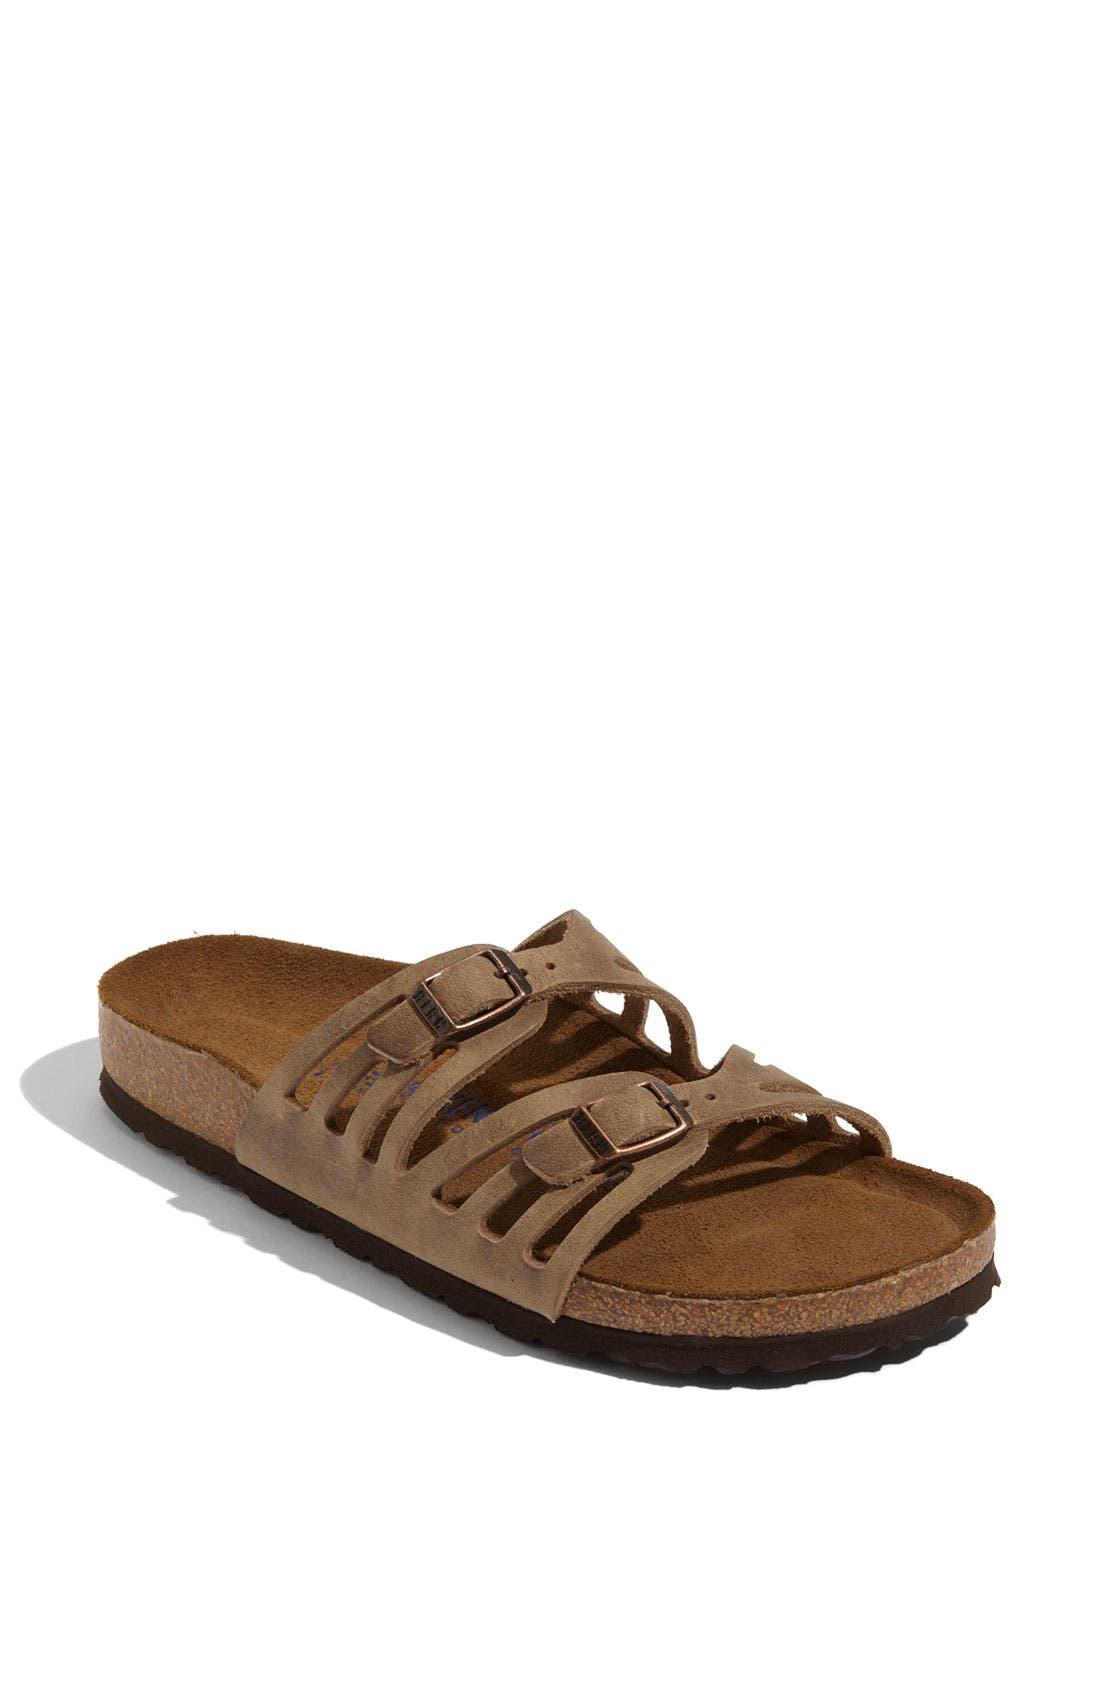 Granada Soft Footbed Oiled Leather Sandal,                             Main thumbnail 1, color,                             TOBACCO